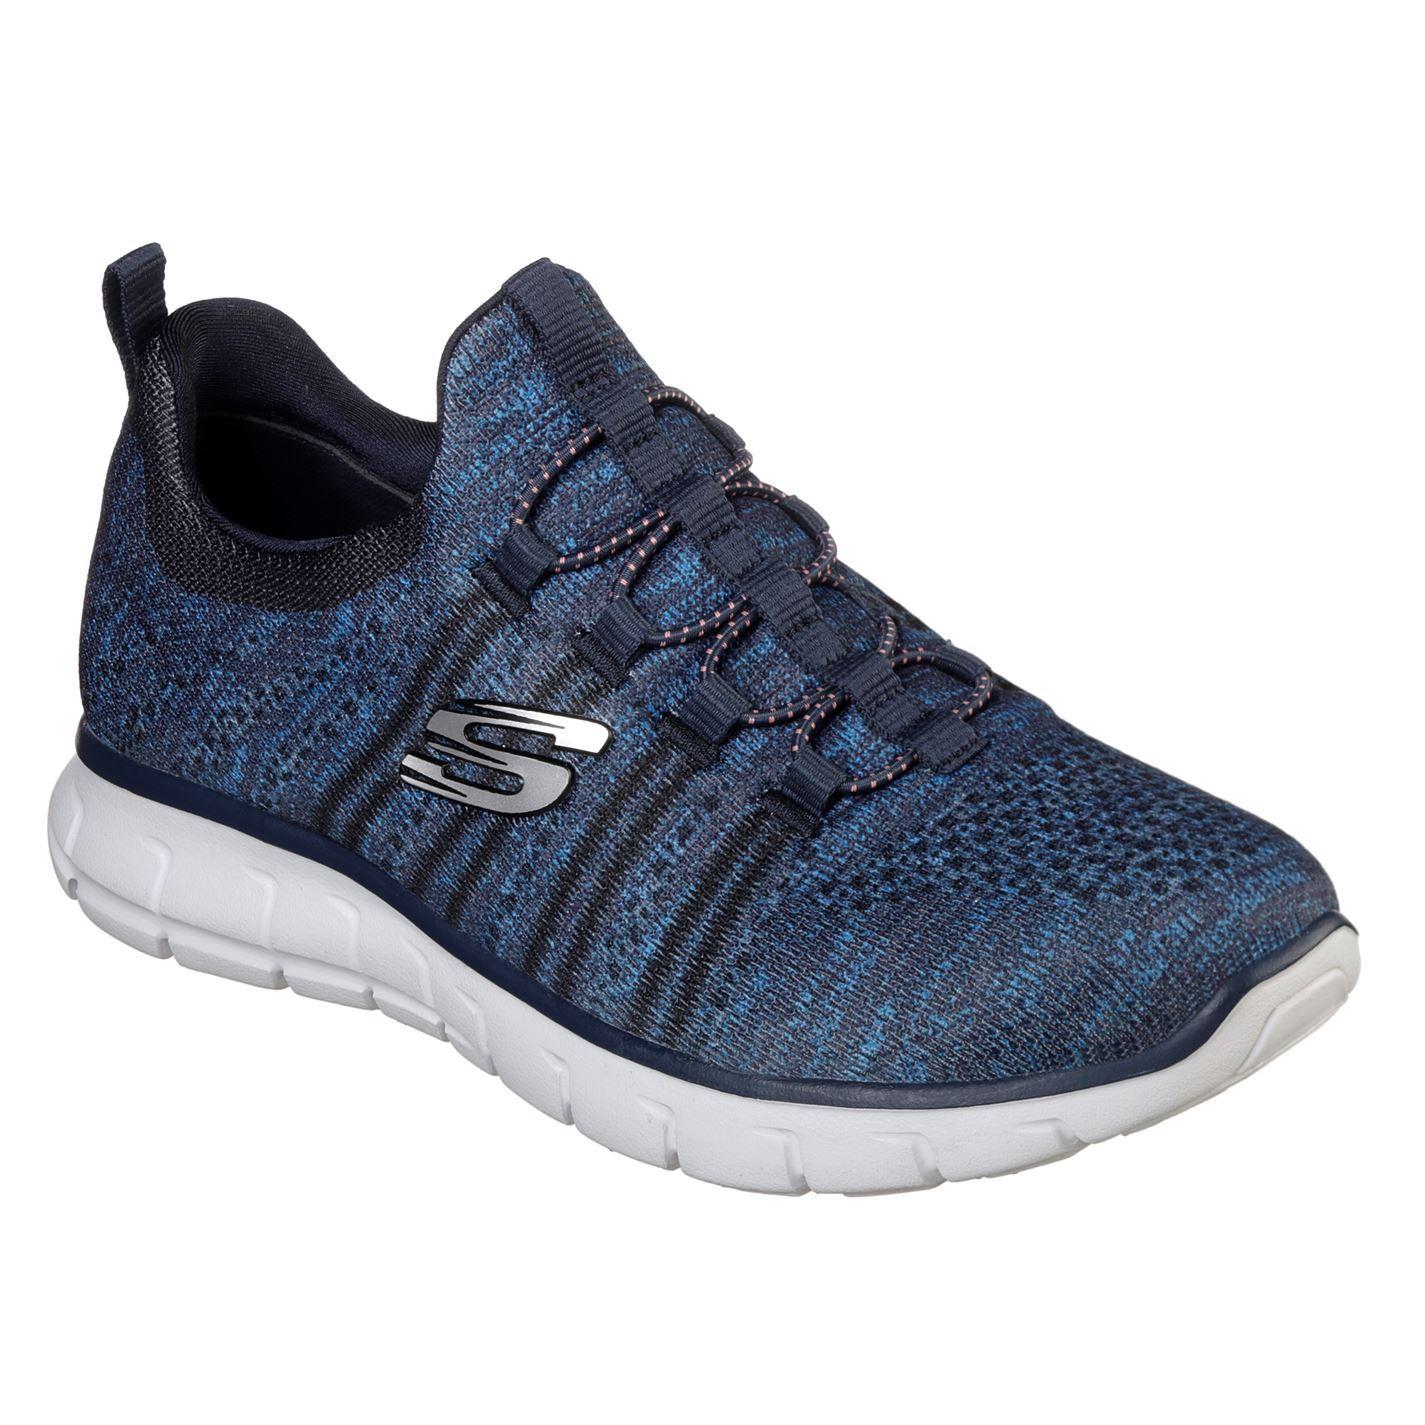 size 40 6b261 981bd ... Skechers VIM Knit Shoes Ladies Womens Footwear